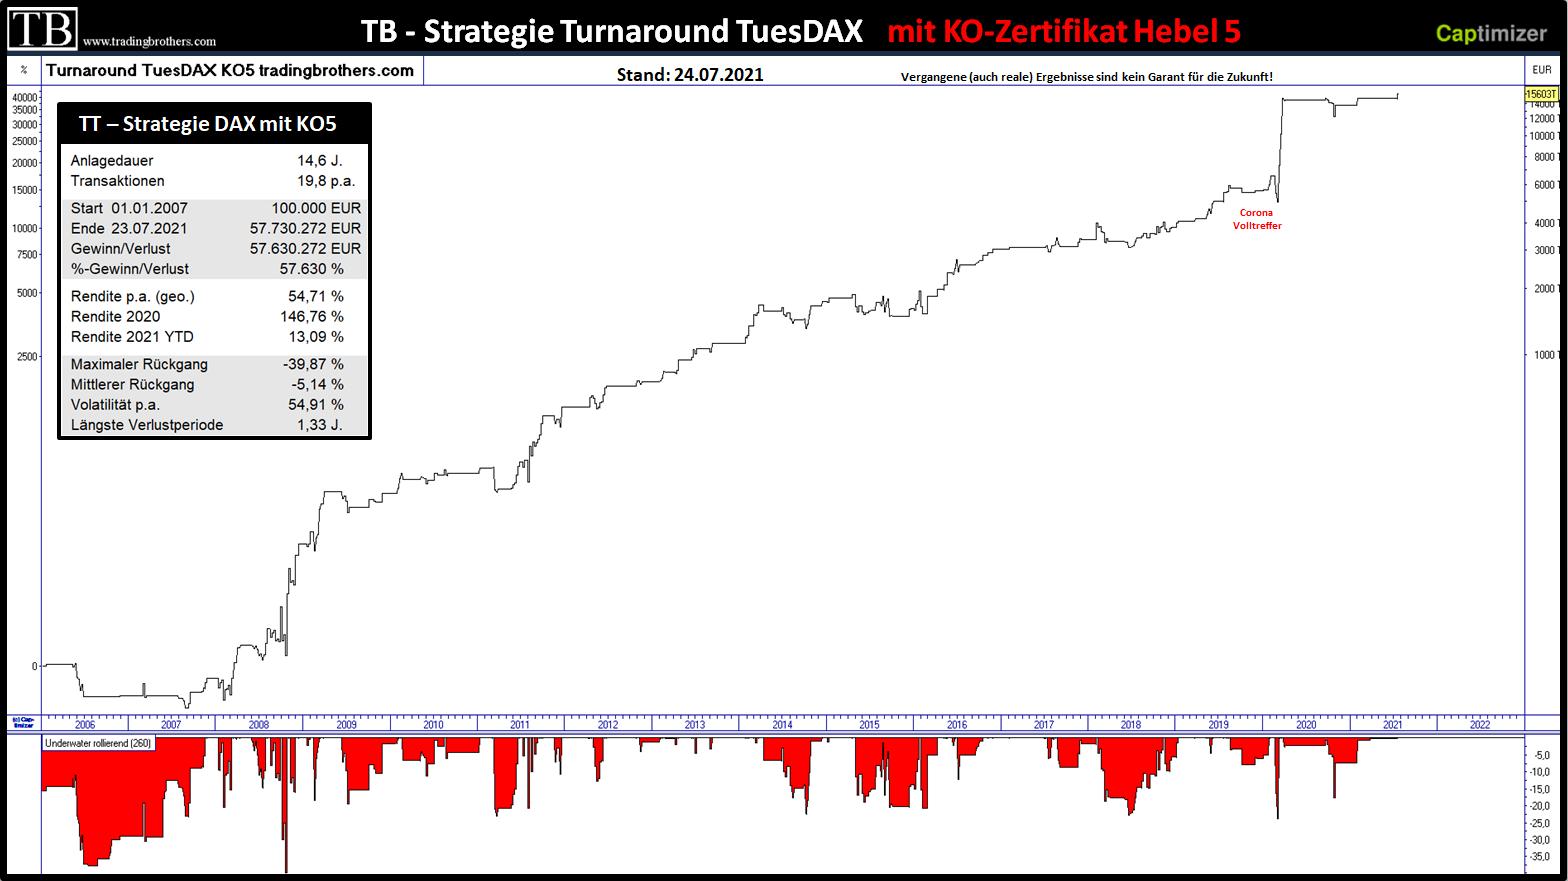 Optimierte Turnaround Tuesday Strategie TradingBrothers